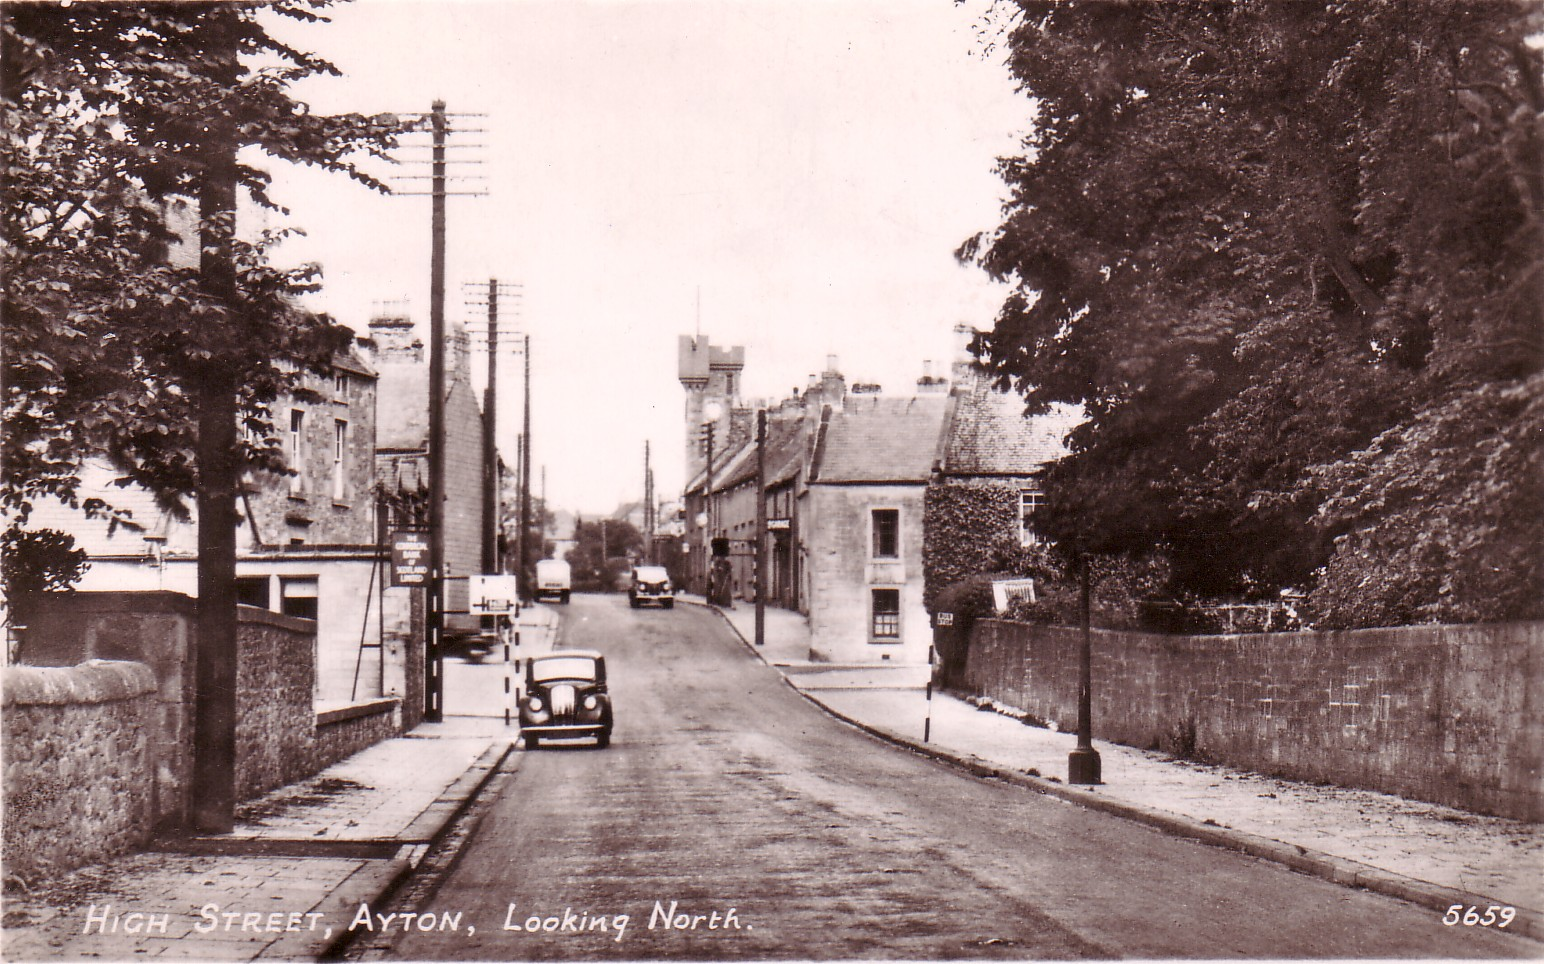 High Street Ayton Looking North